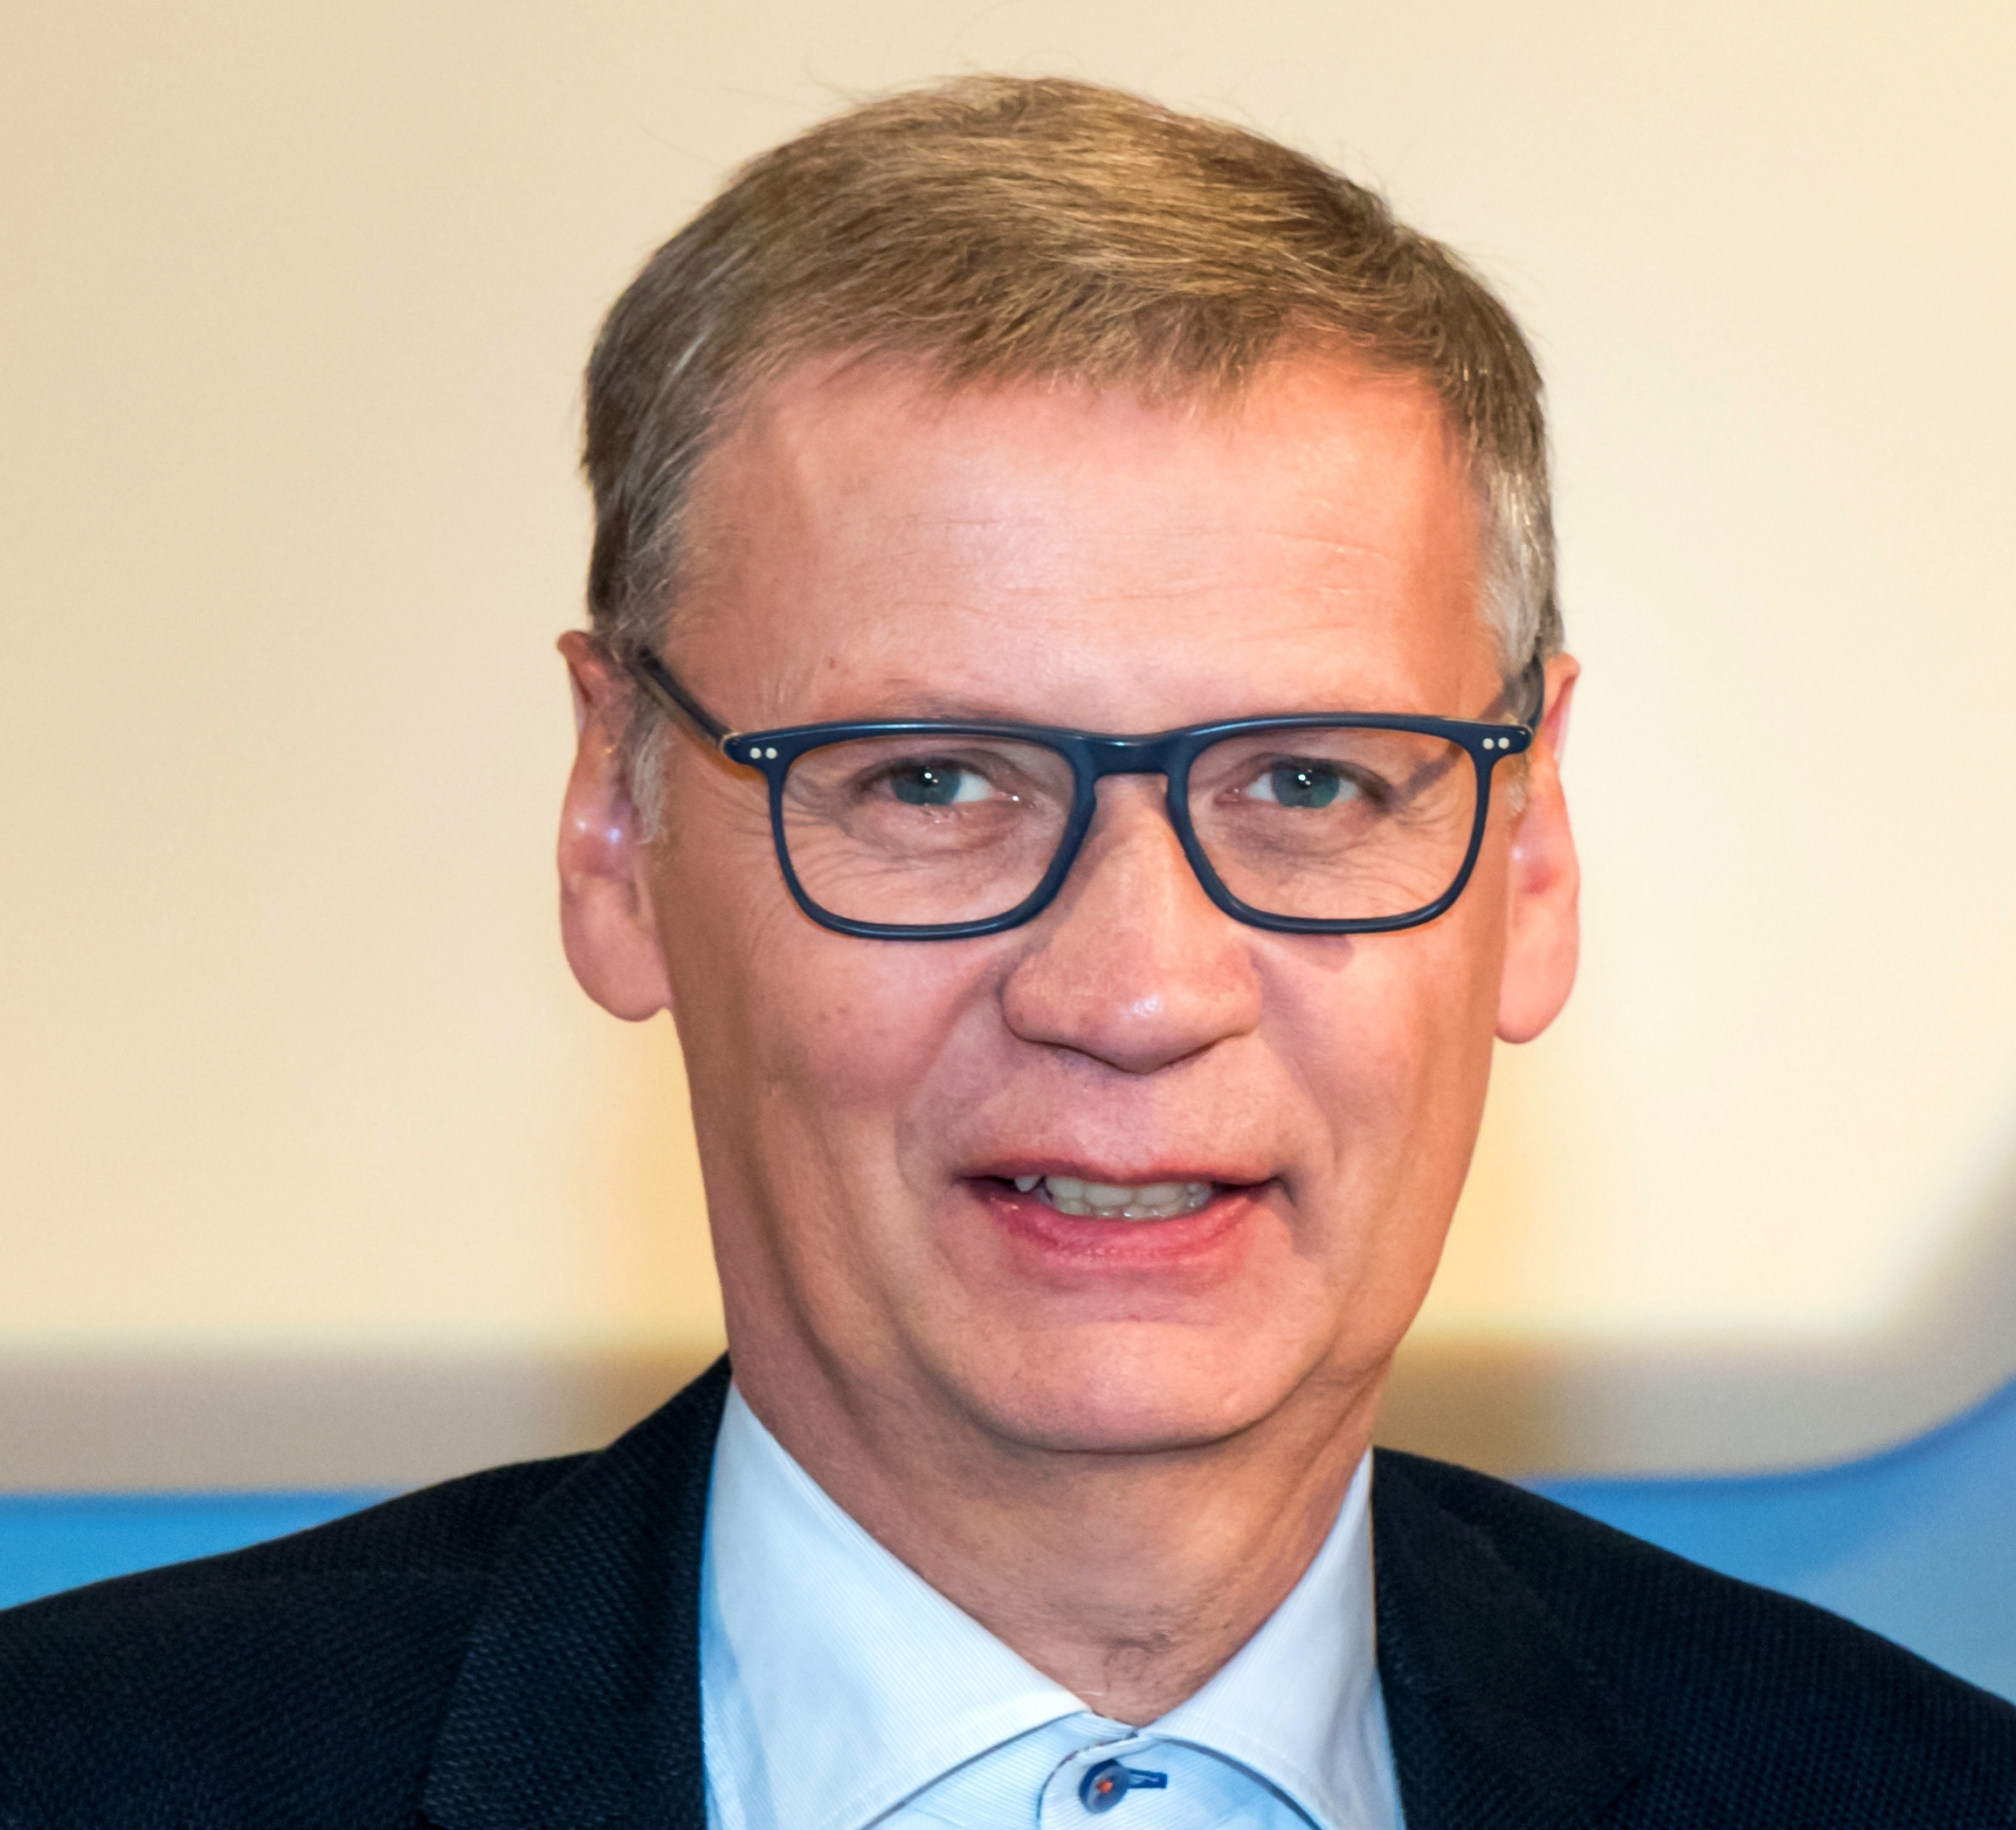 Günther Jauch Tod